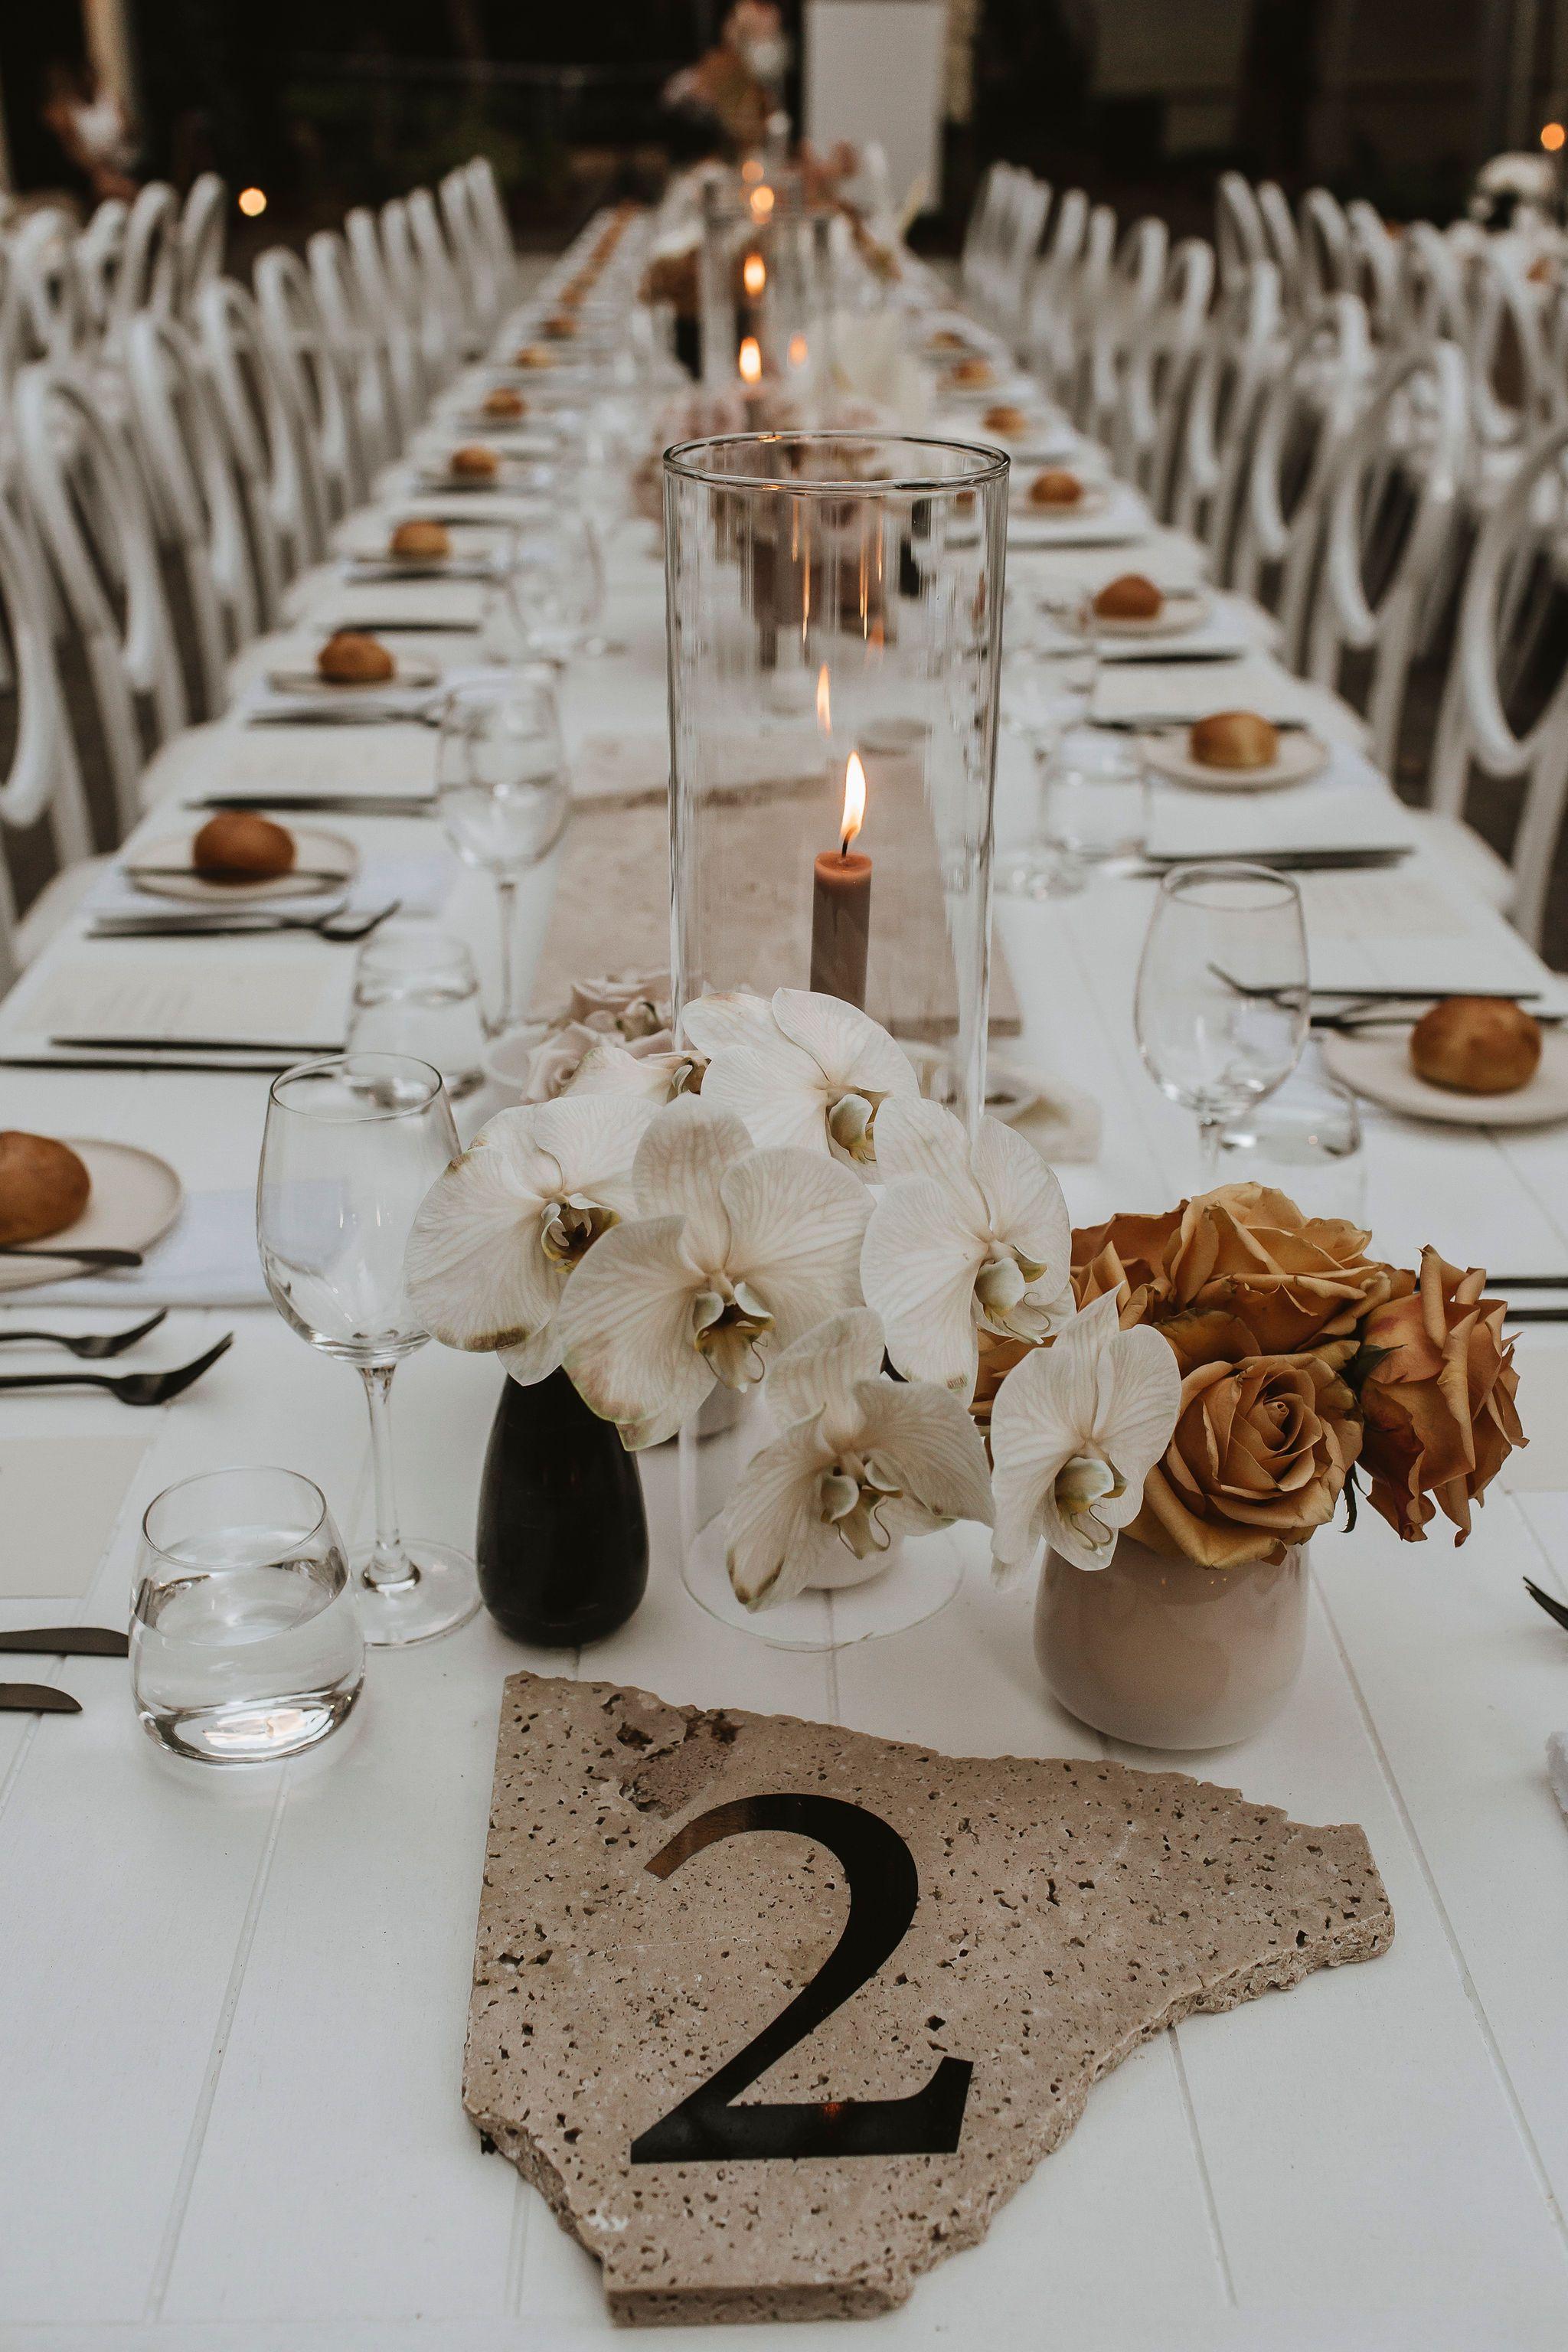 B+M // TKCS Weddings in 2020 Wedding table, Wedding